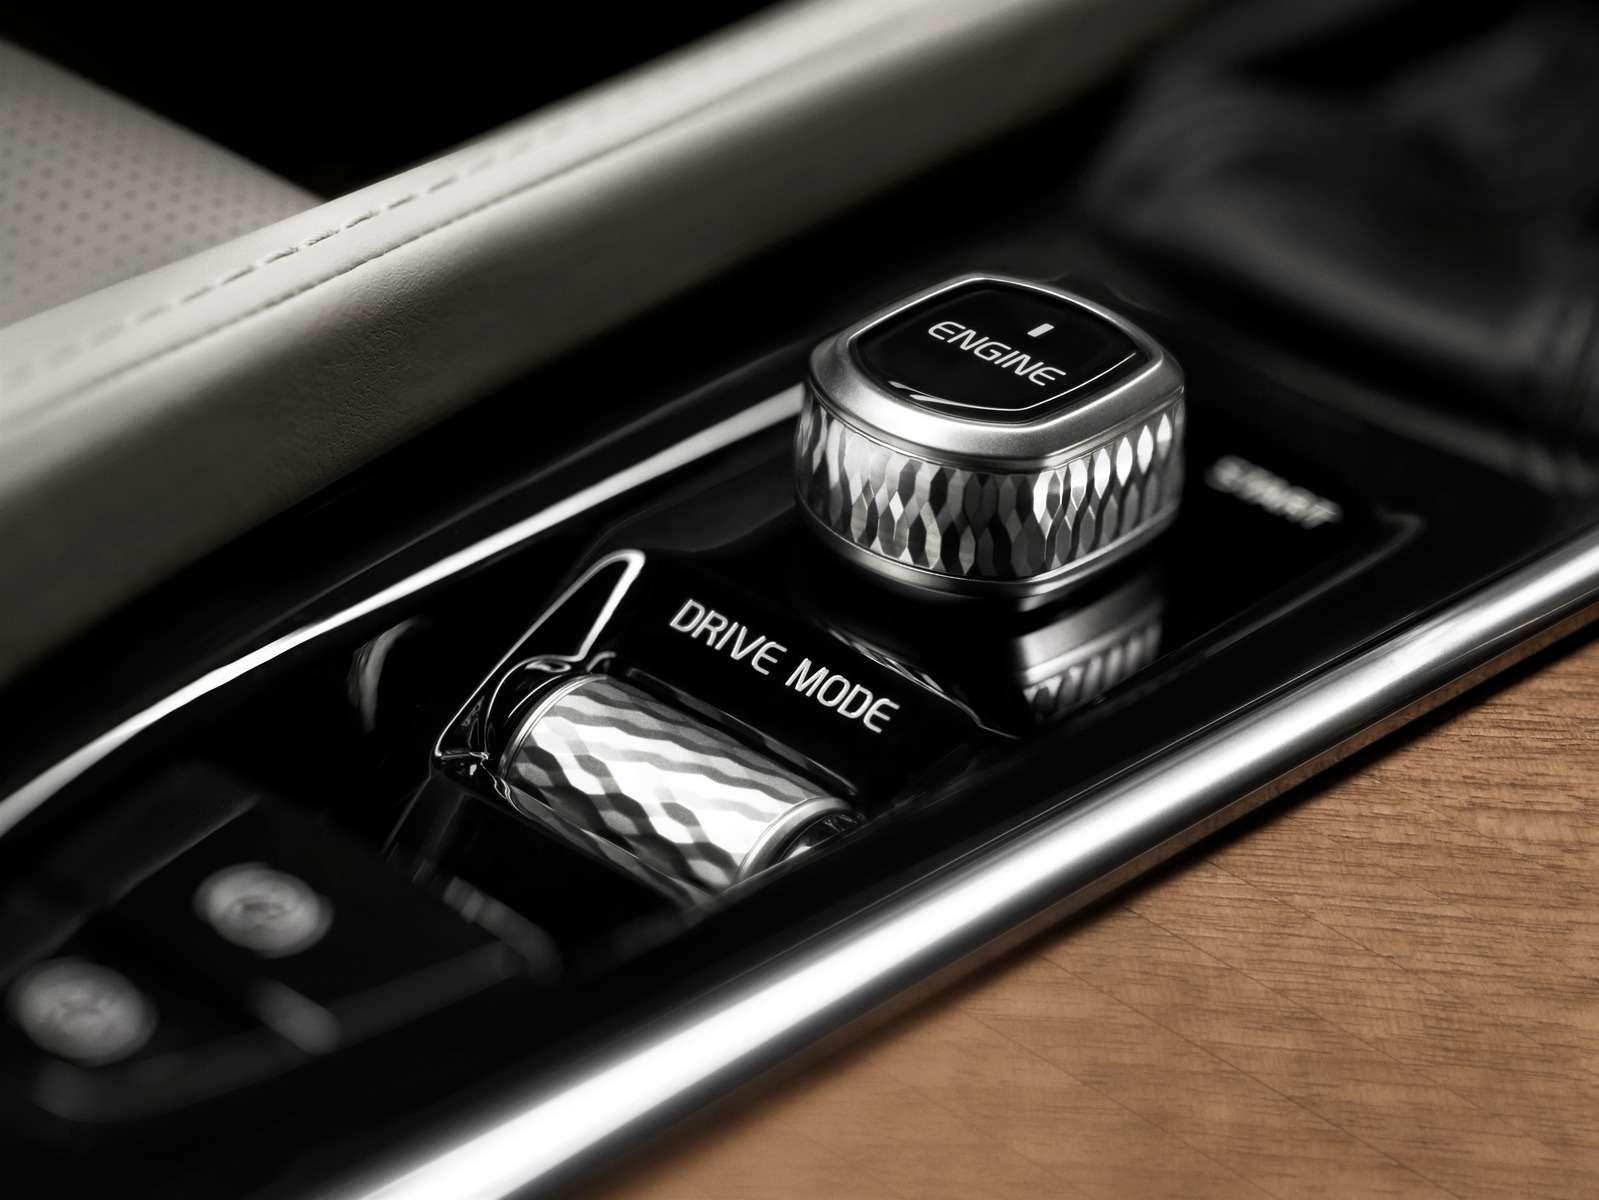 Theall-new Volvo XC90